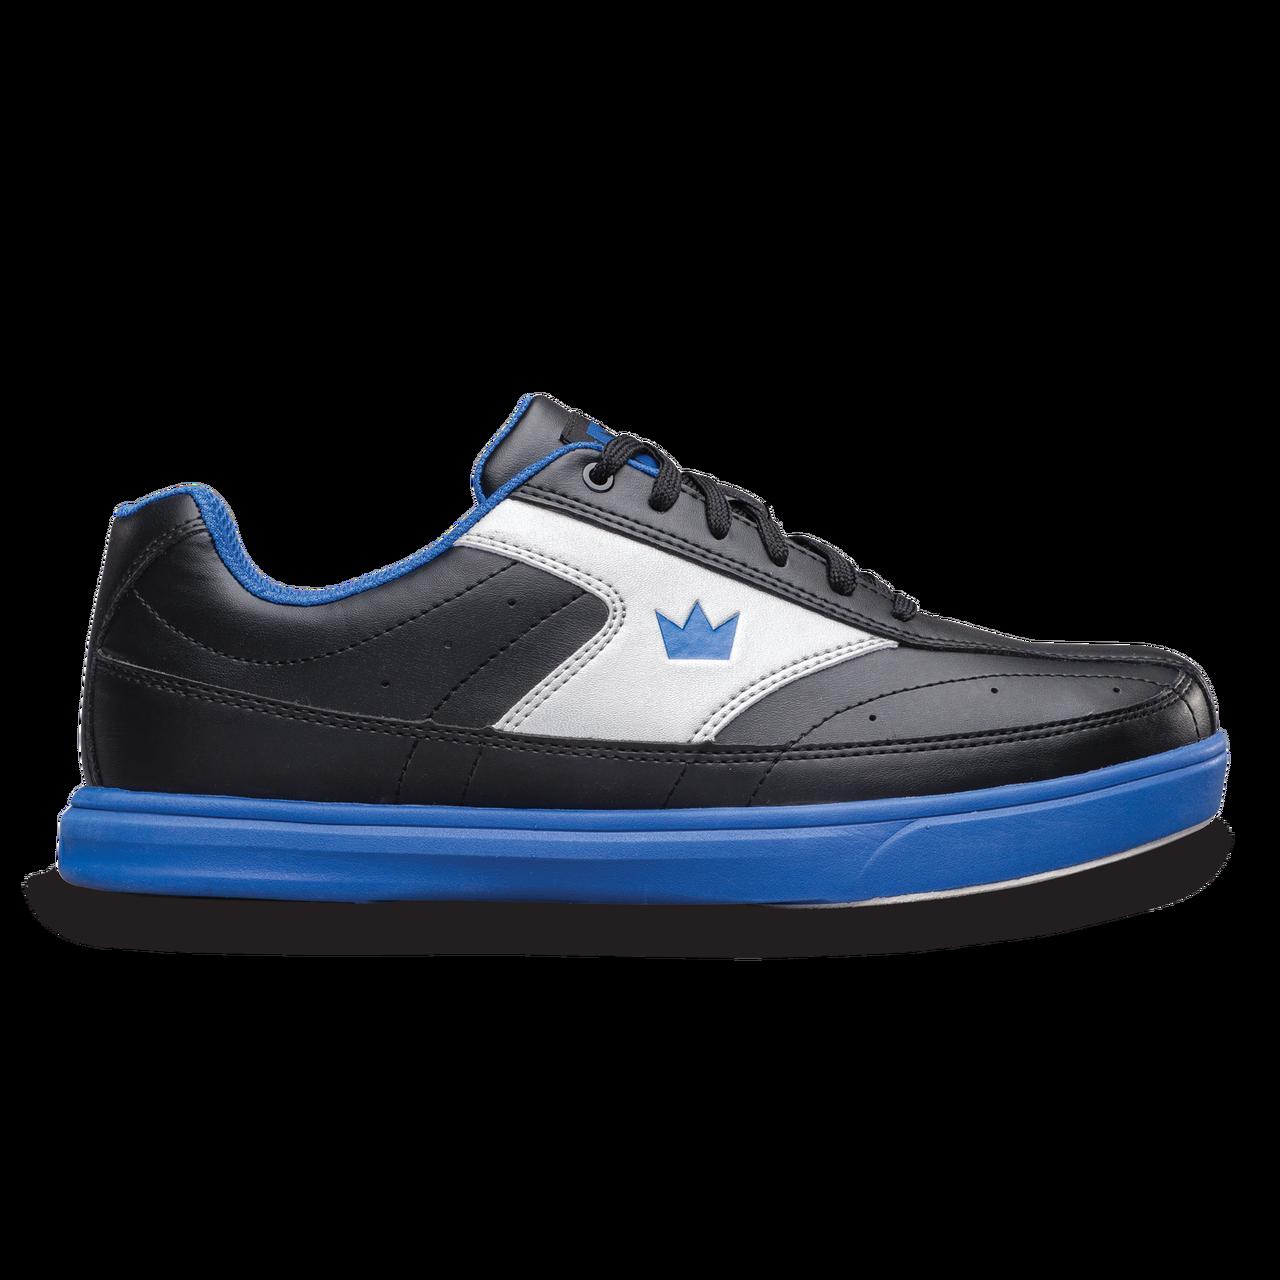 7fae8eeadb Brunswick Renegade Mens Bowling Shoes Black/Royal